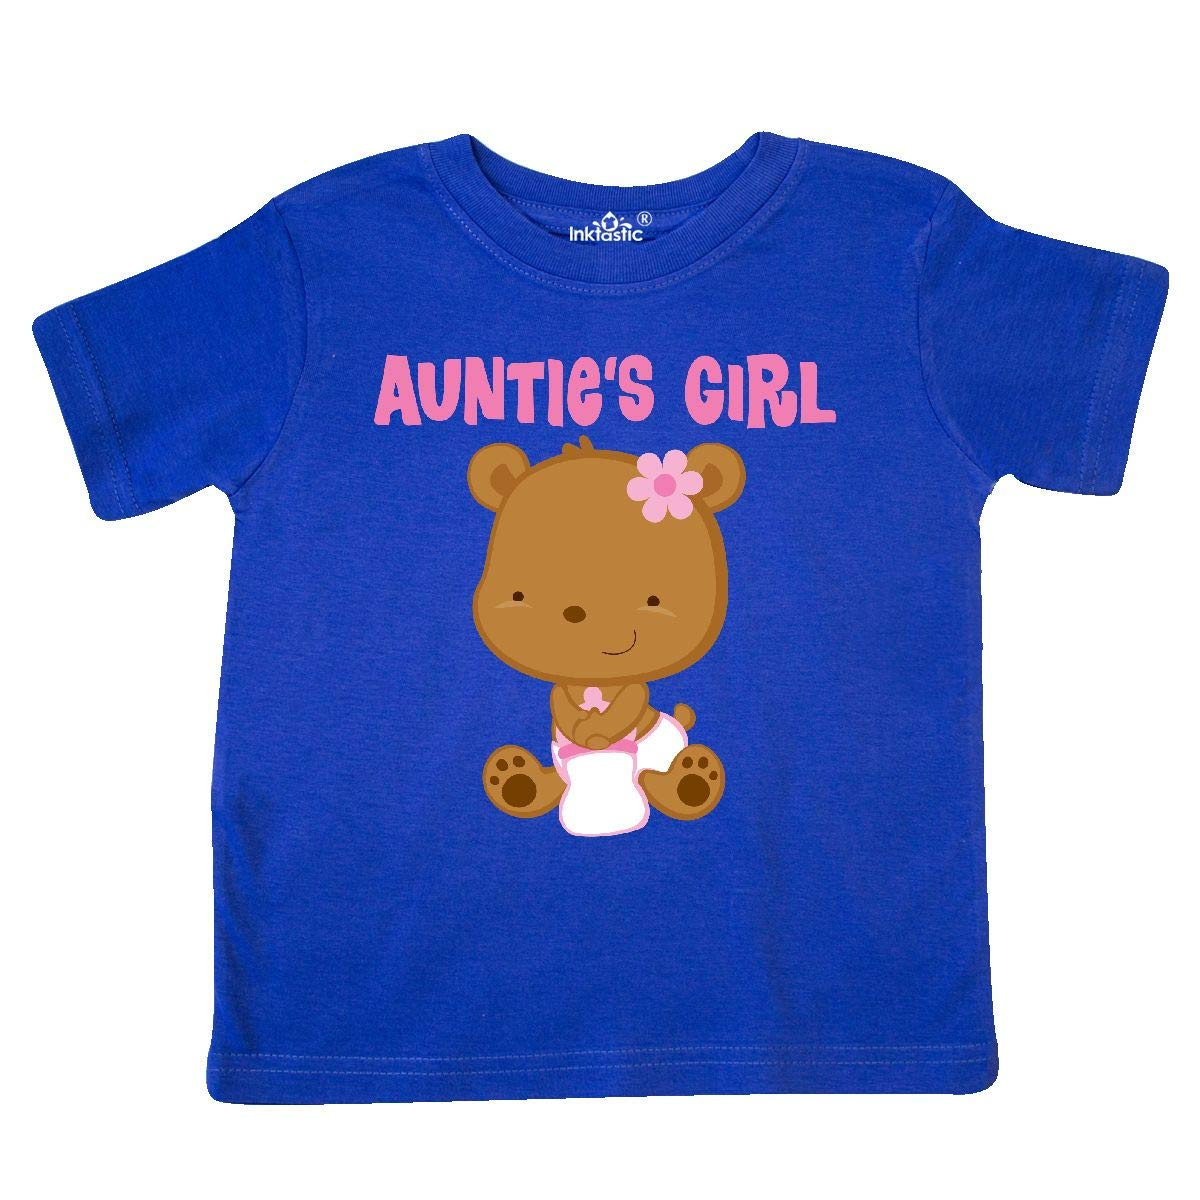 inktastic Aunties Girl Toddler T-Shirt